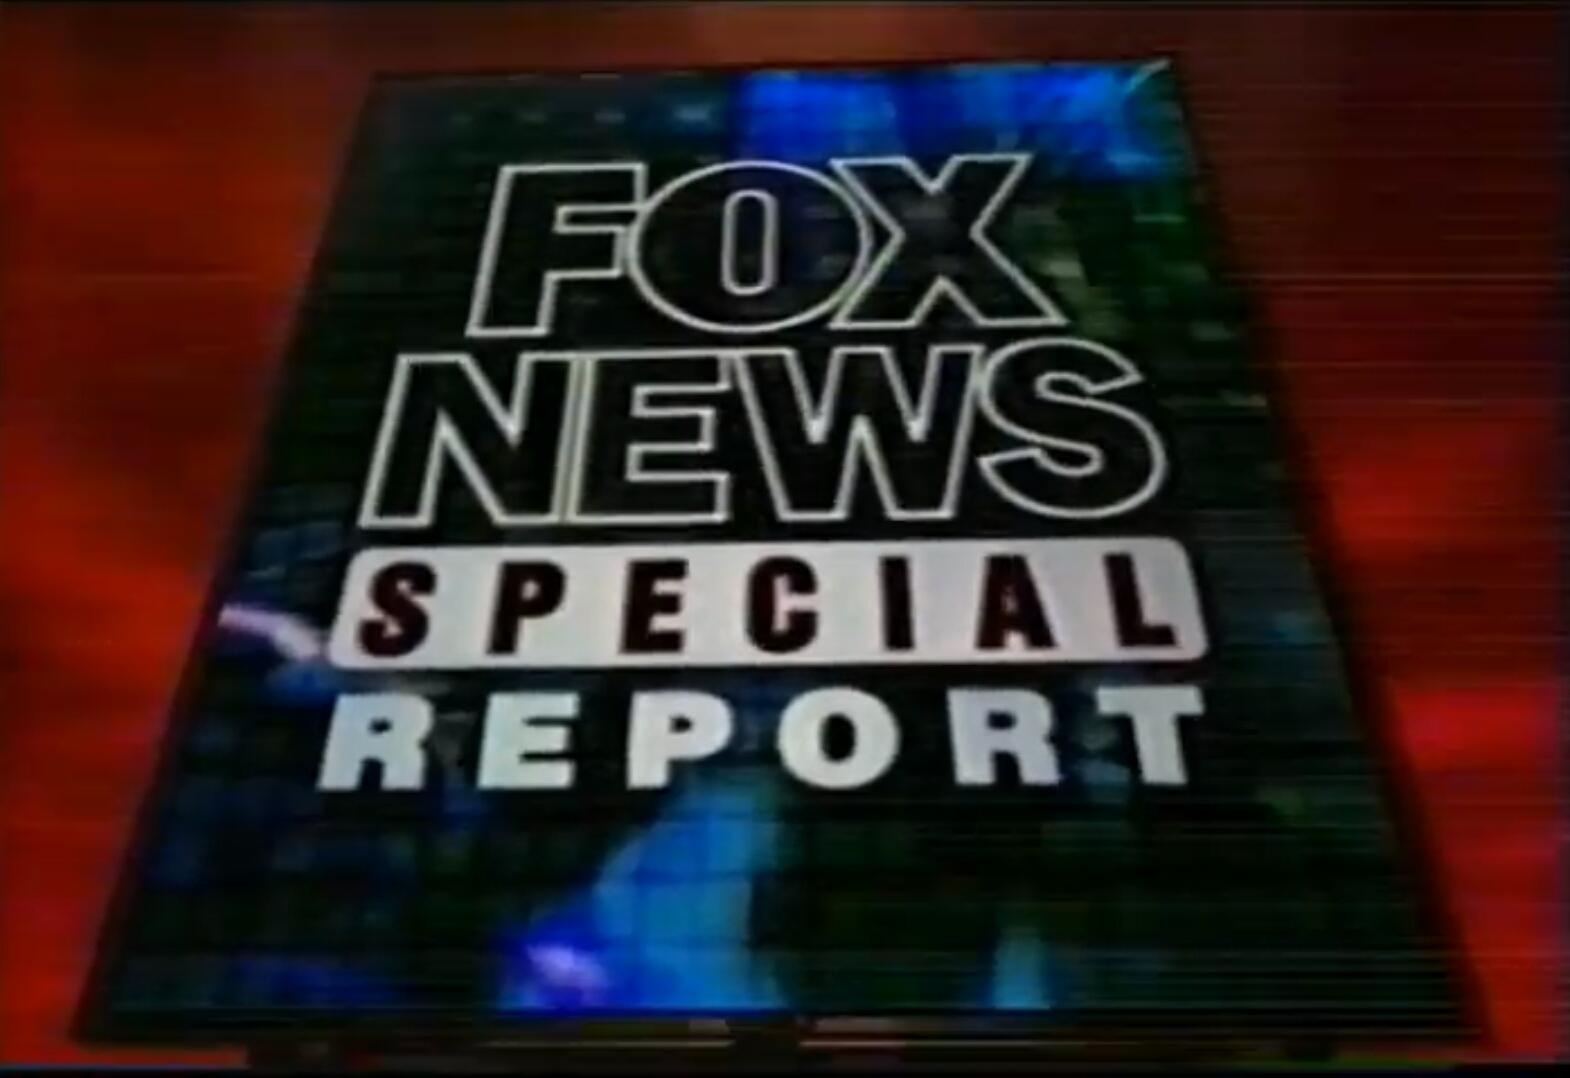 Fox News Special Report